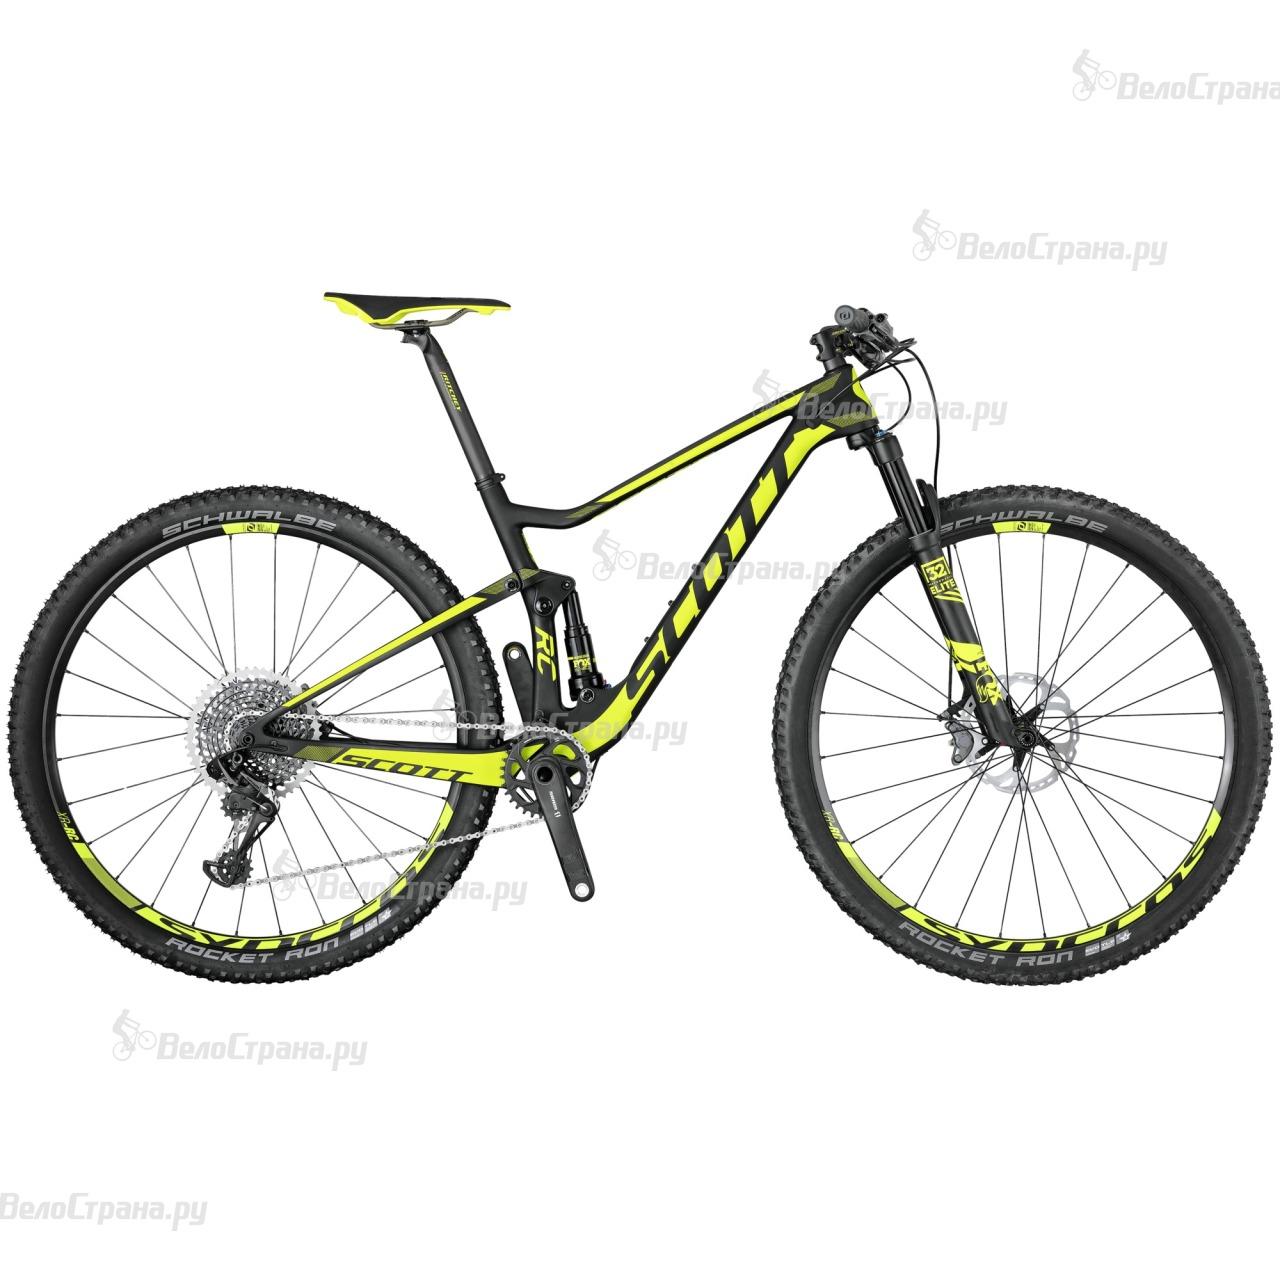 Велосипед Scott Spark RC 700 World Cup (2017) велосипед scott spark 700 premium 2015